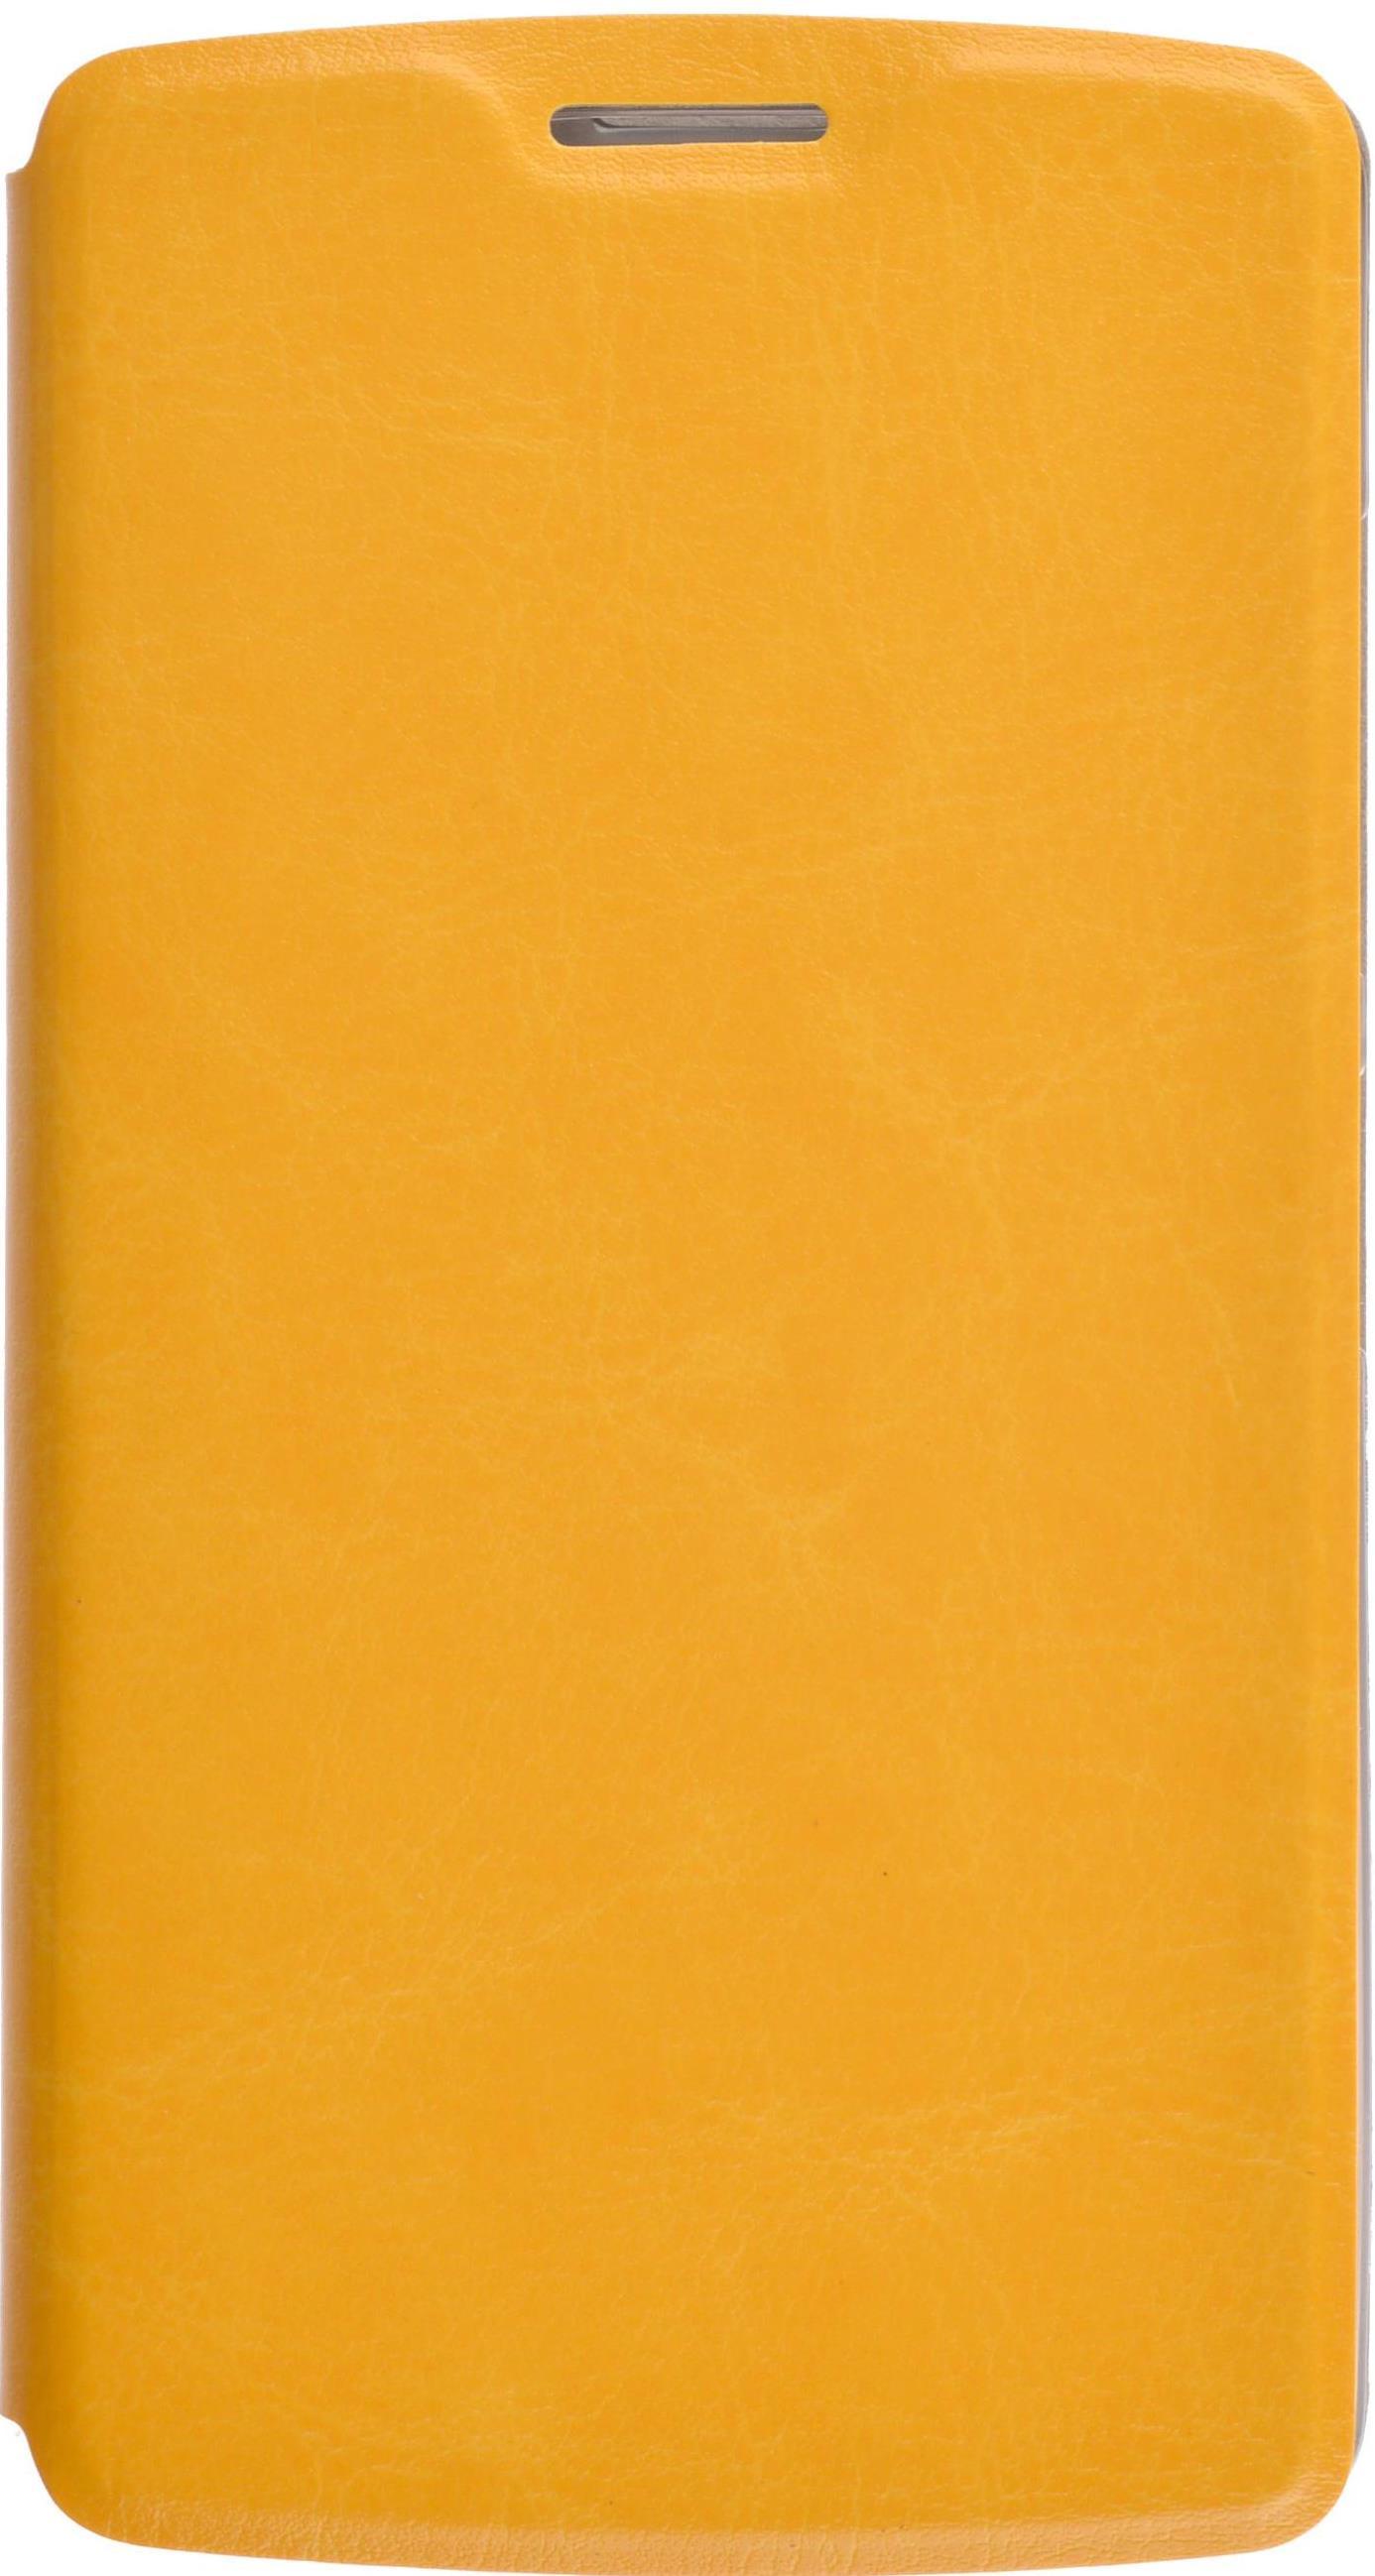 Чехол Skinbox Lux для Lenovo A2010, 2000000082899, желтый чехол для lenovo a2010 skinbox 4people shield case черный